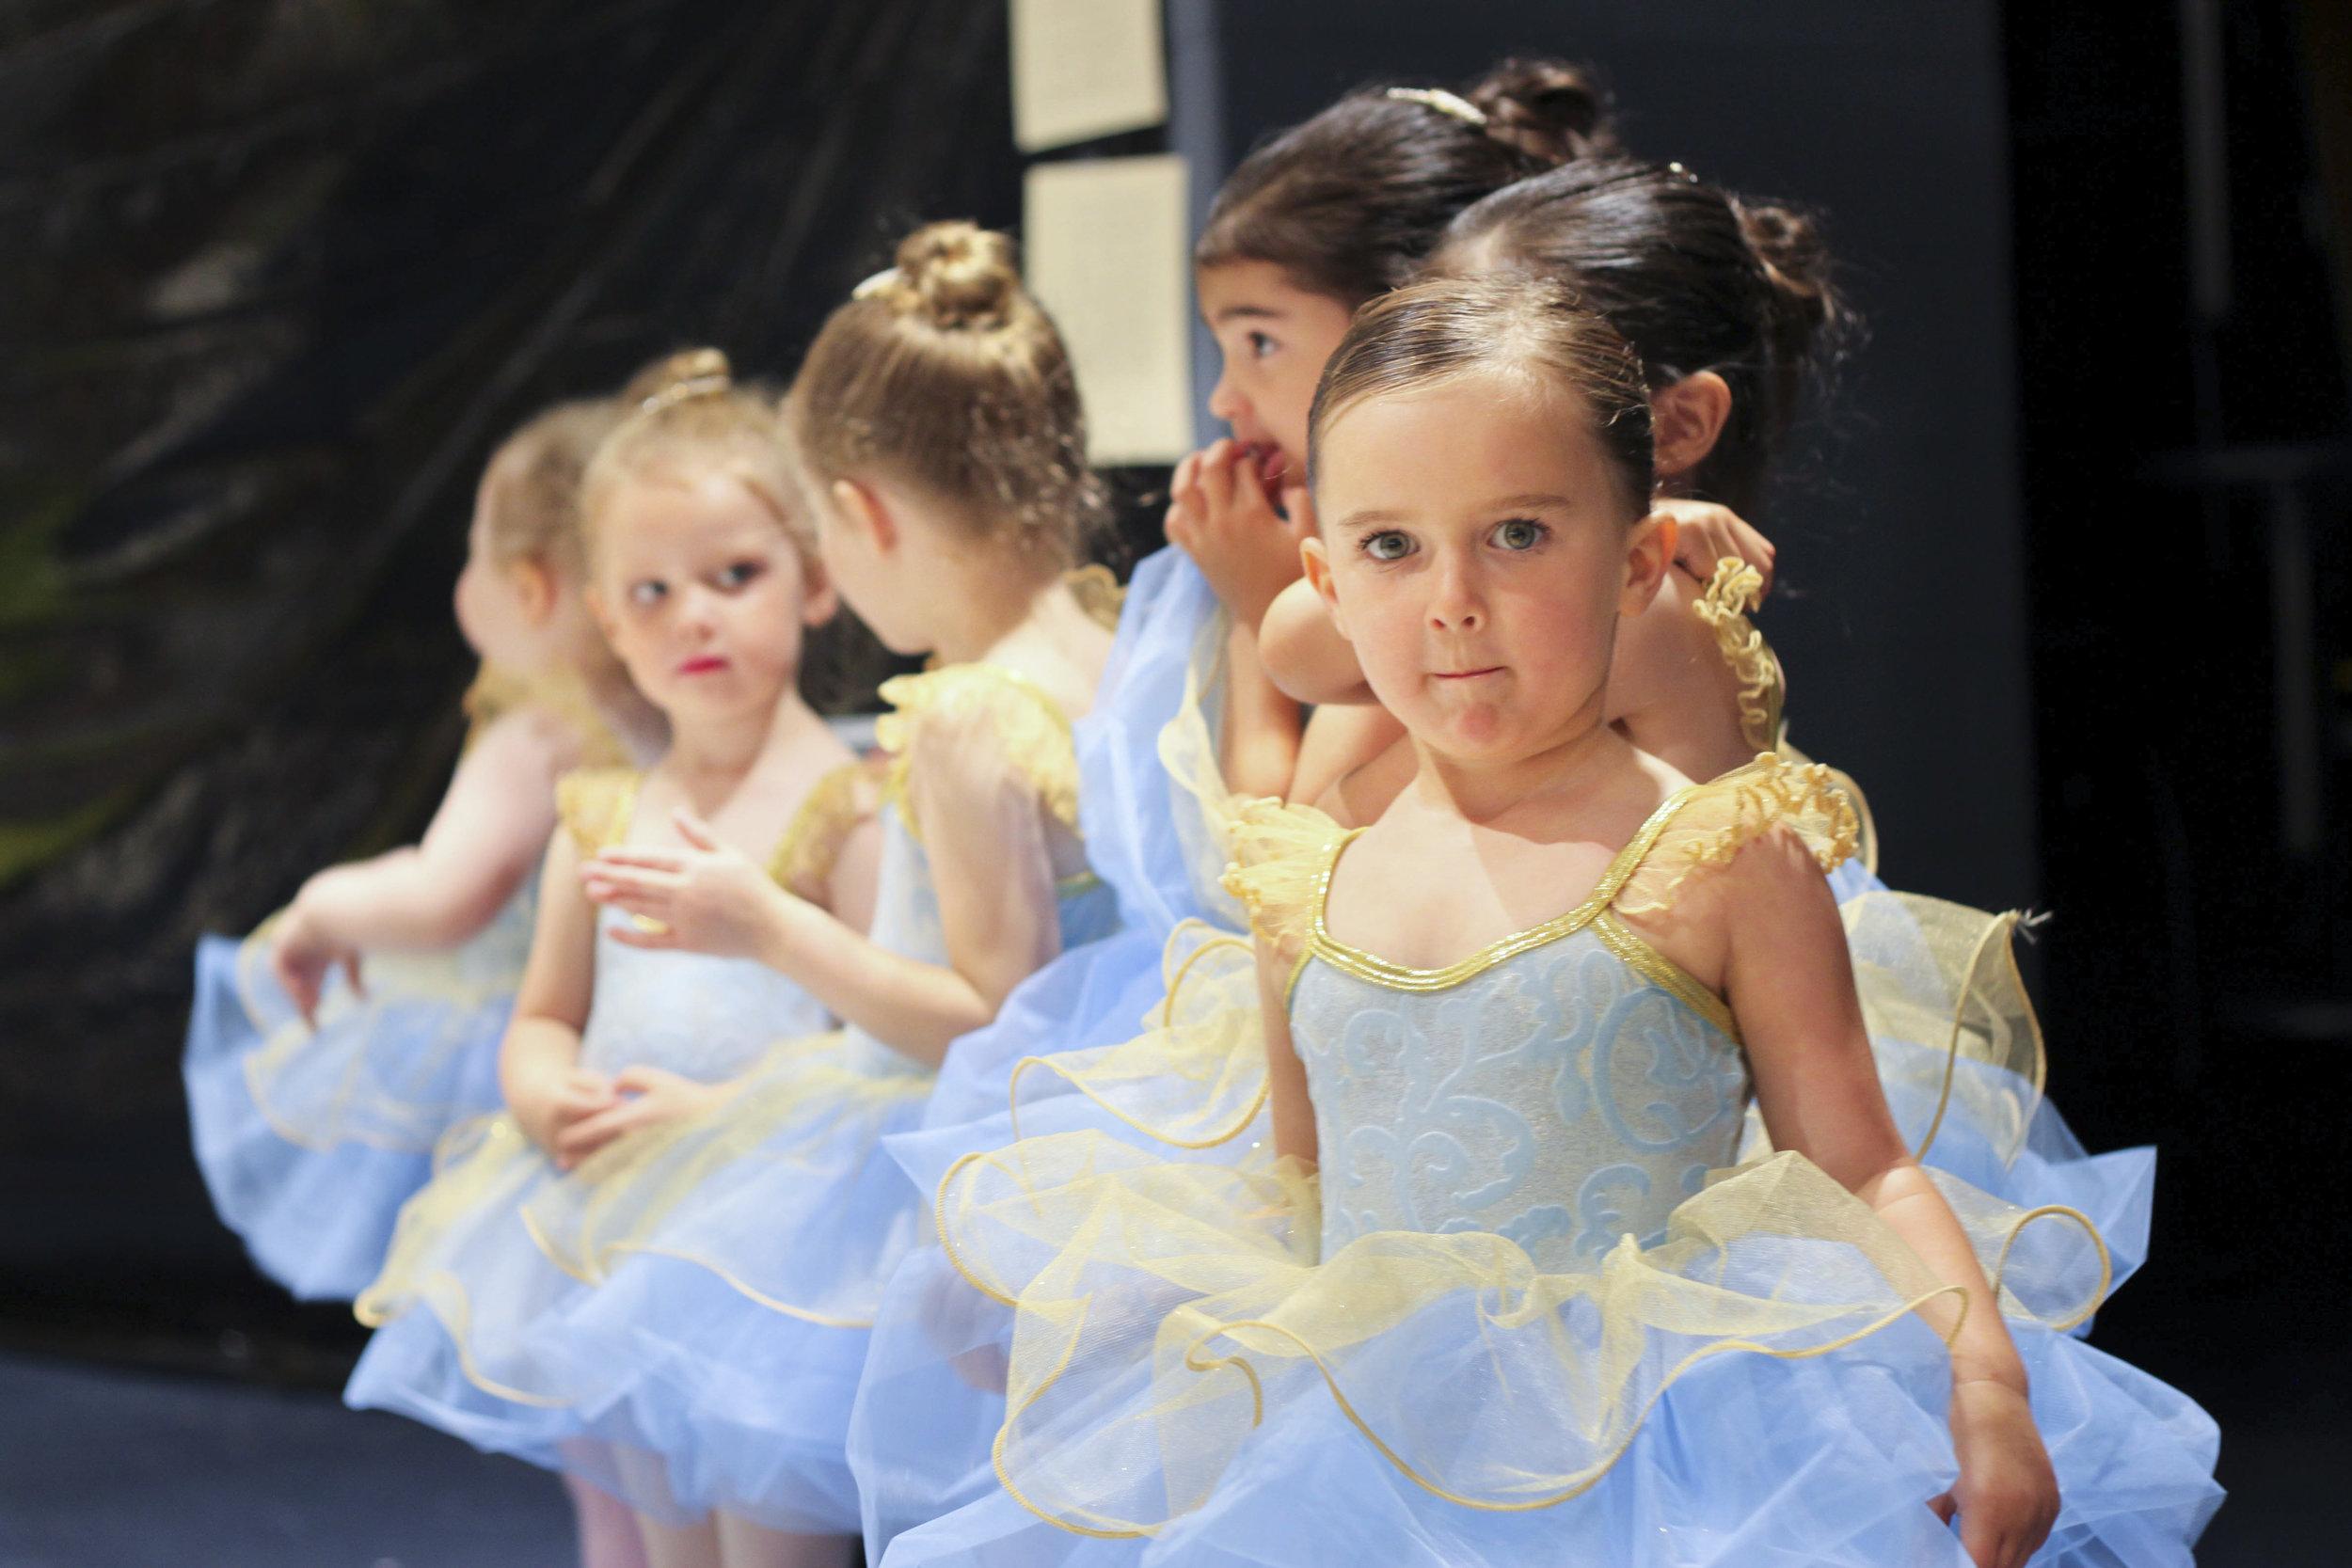 Dance_Children_Recital_Photo2.jpg